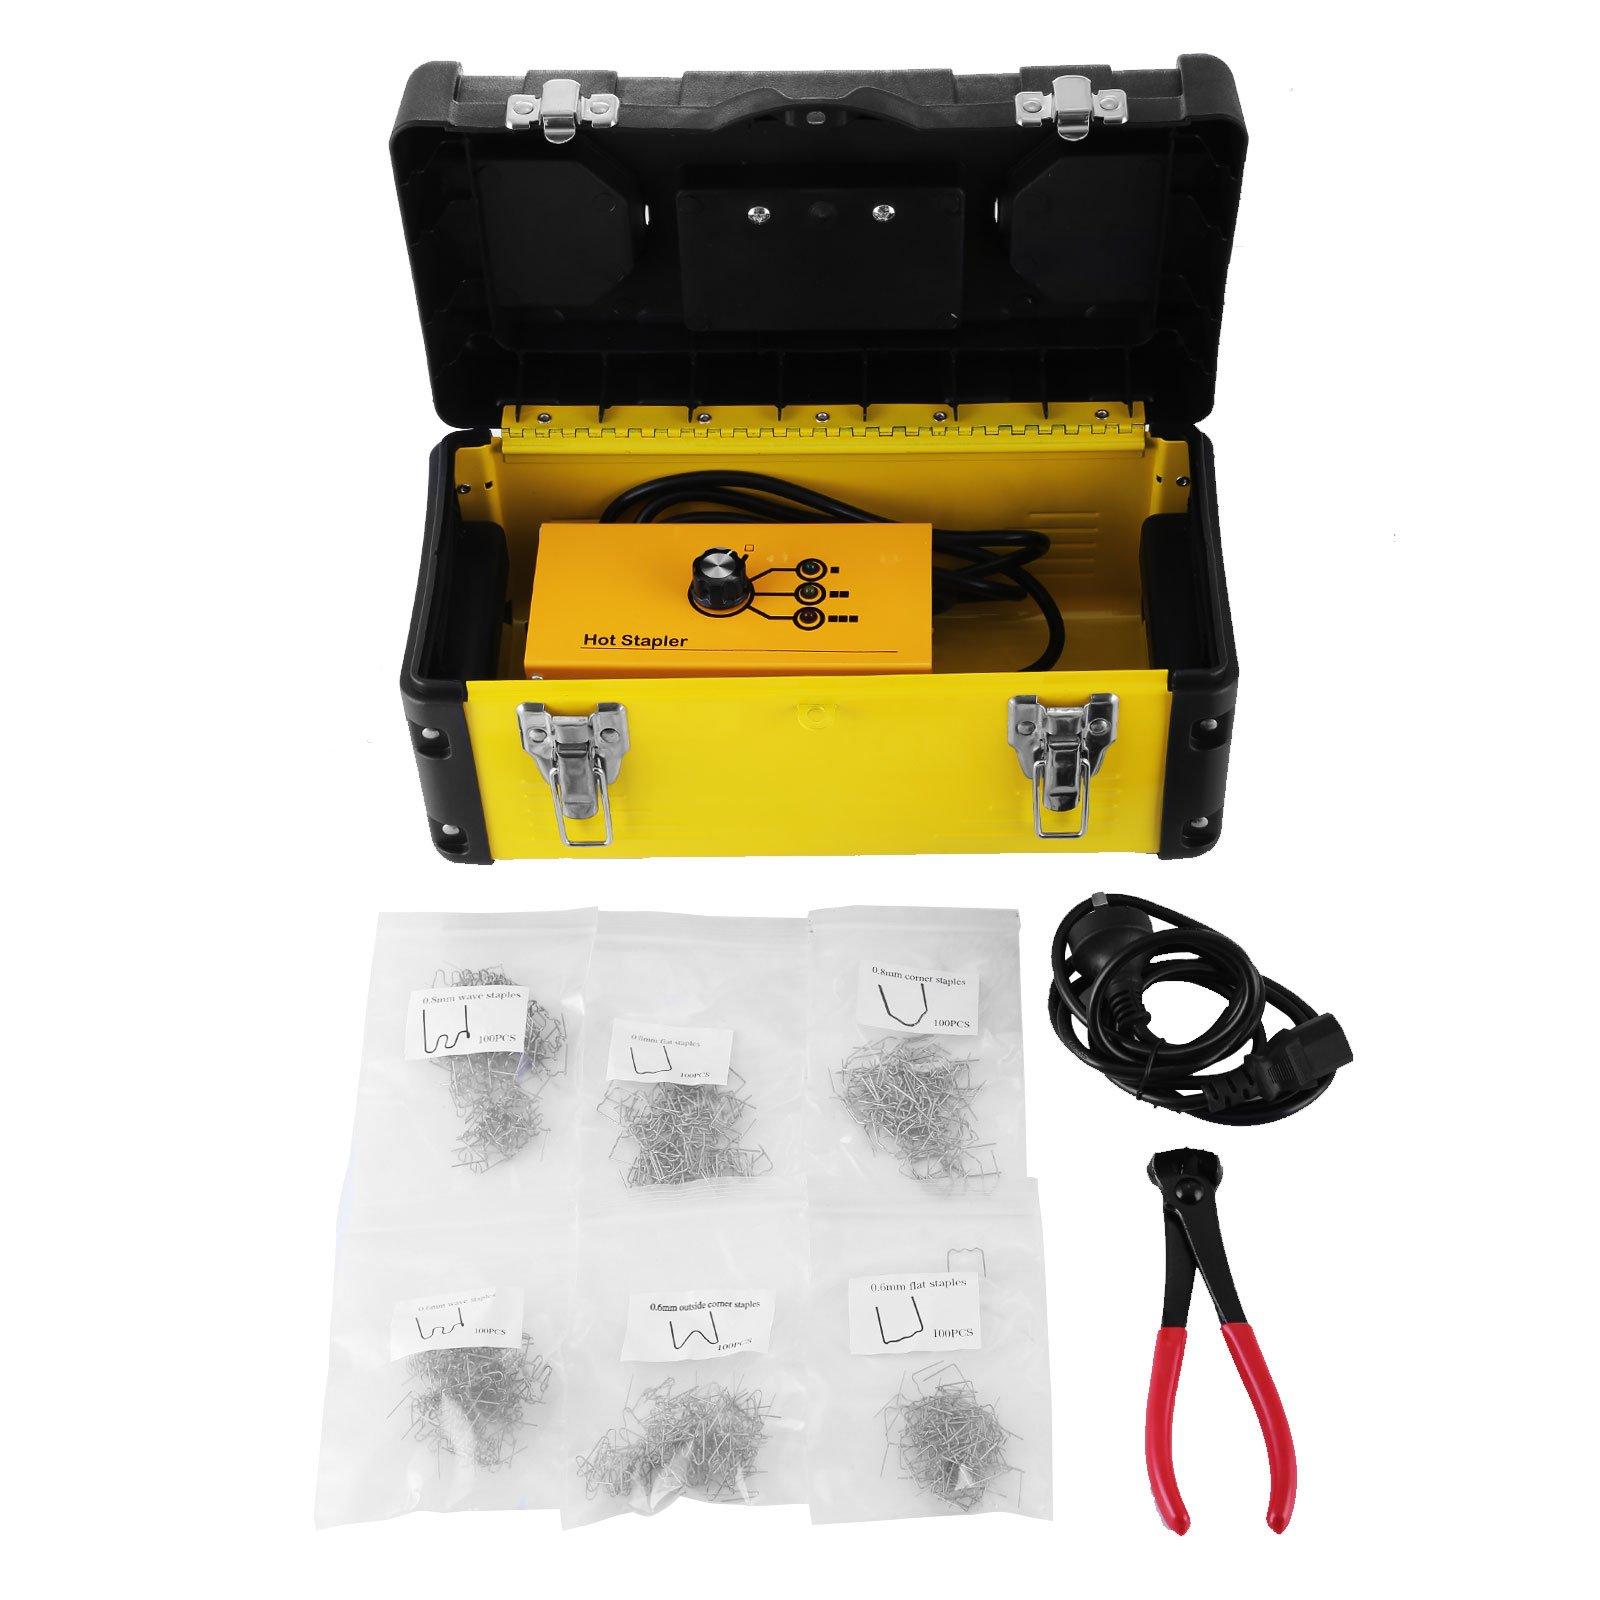 Mophorn Hot Stapler Plastic Repair Kit 600 Staples Tool Box 20W Plastic Welder Kit for Plastic Repair Thermo Repair (600 Staples)